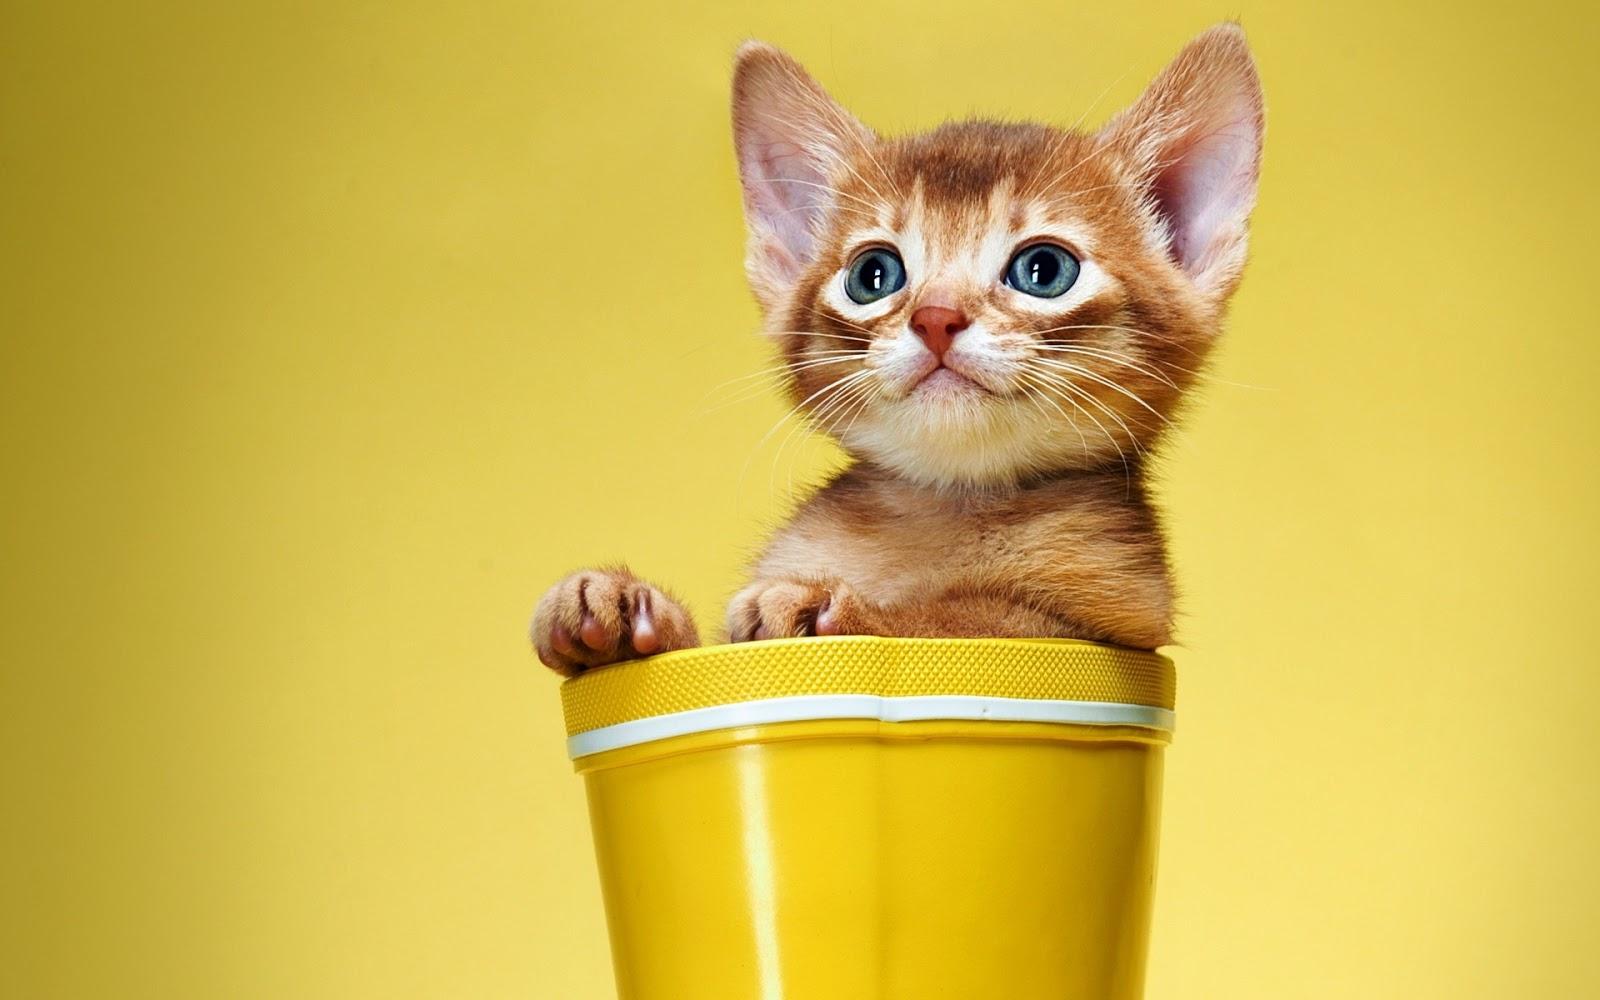 hình nền mèo con cute